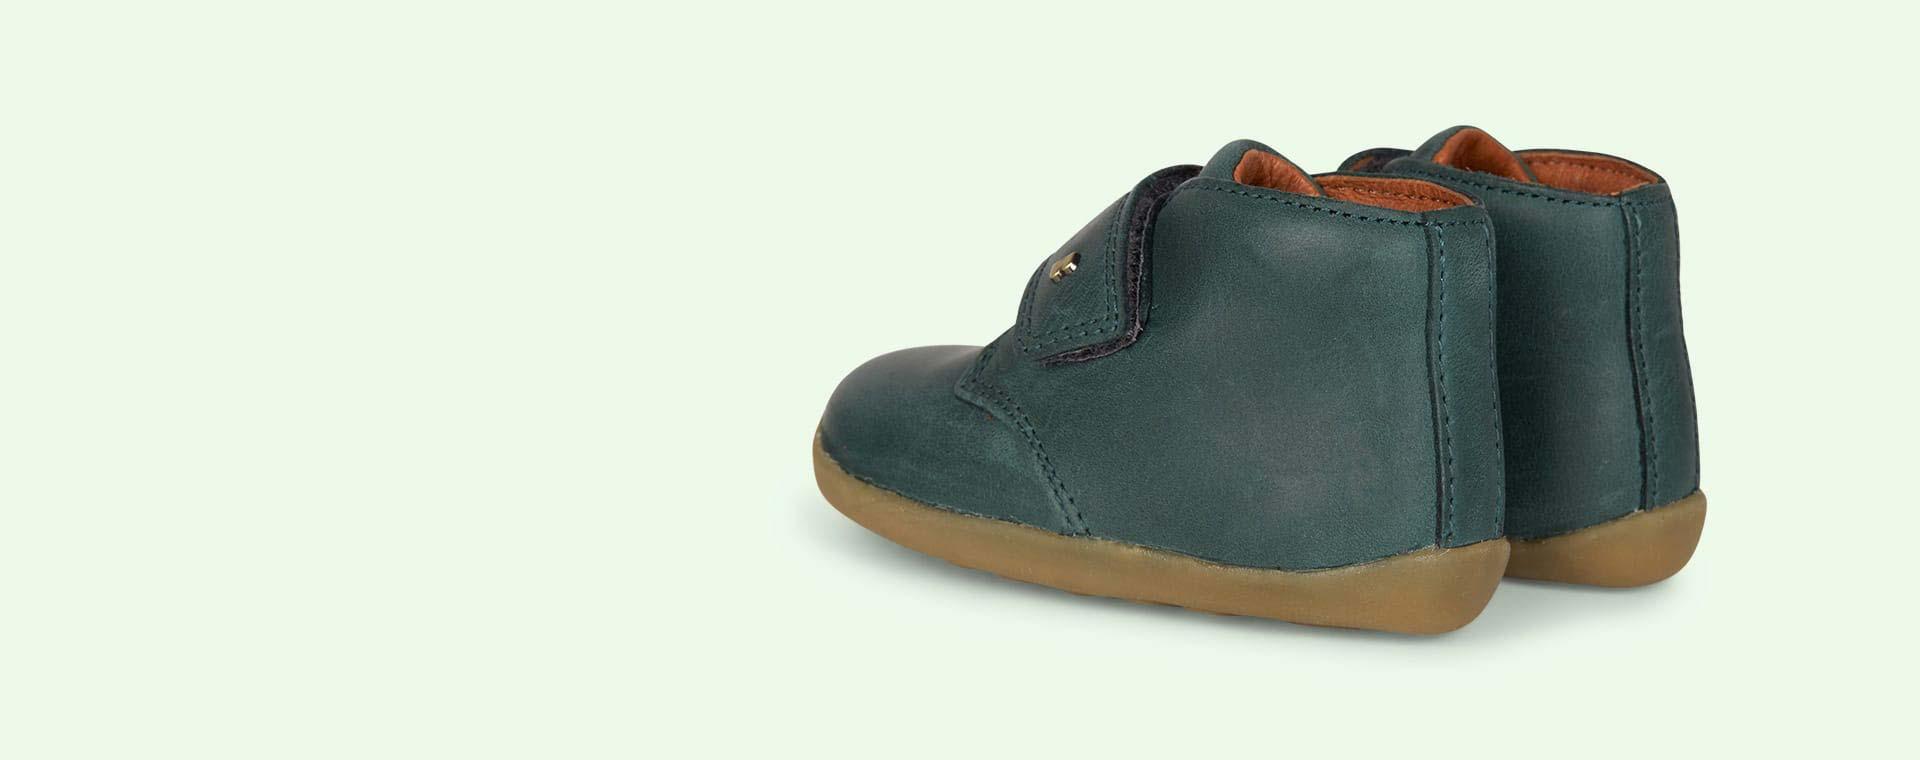 Forest Bobux Desert Step-Up Boot